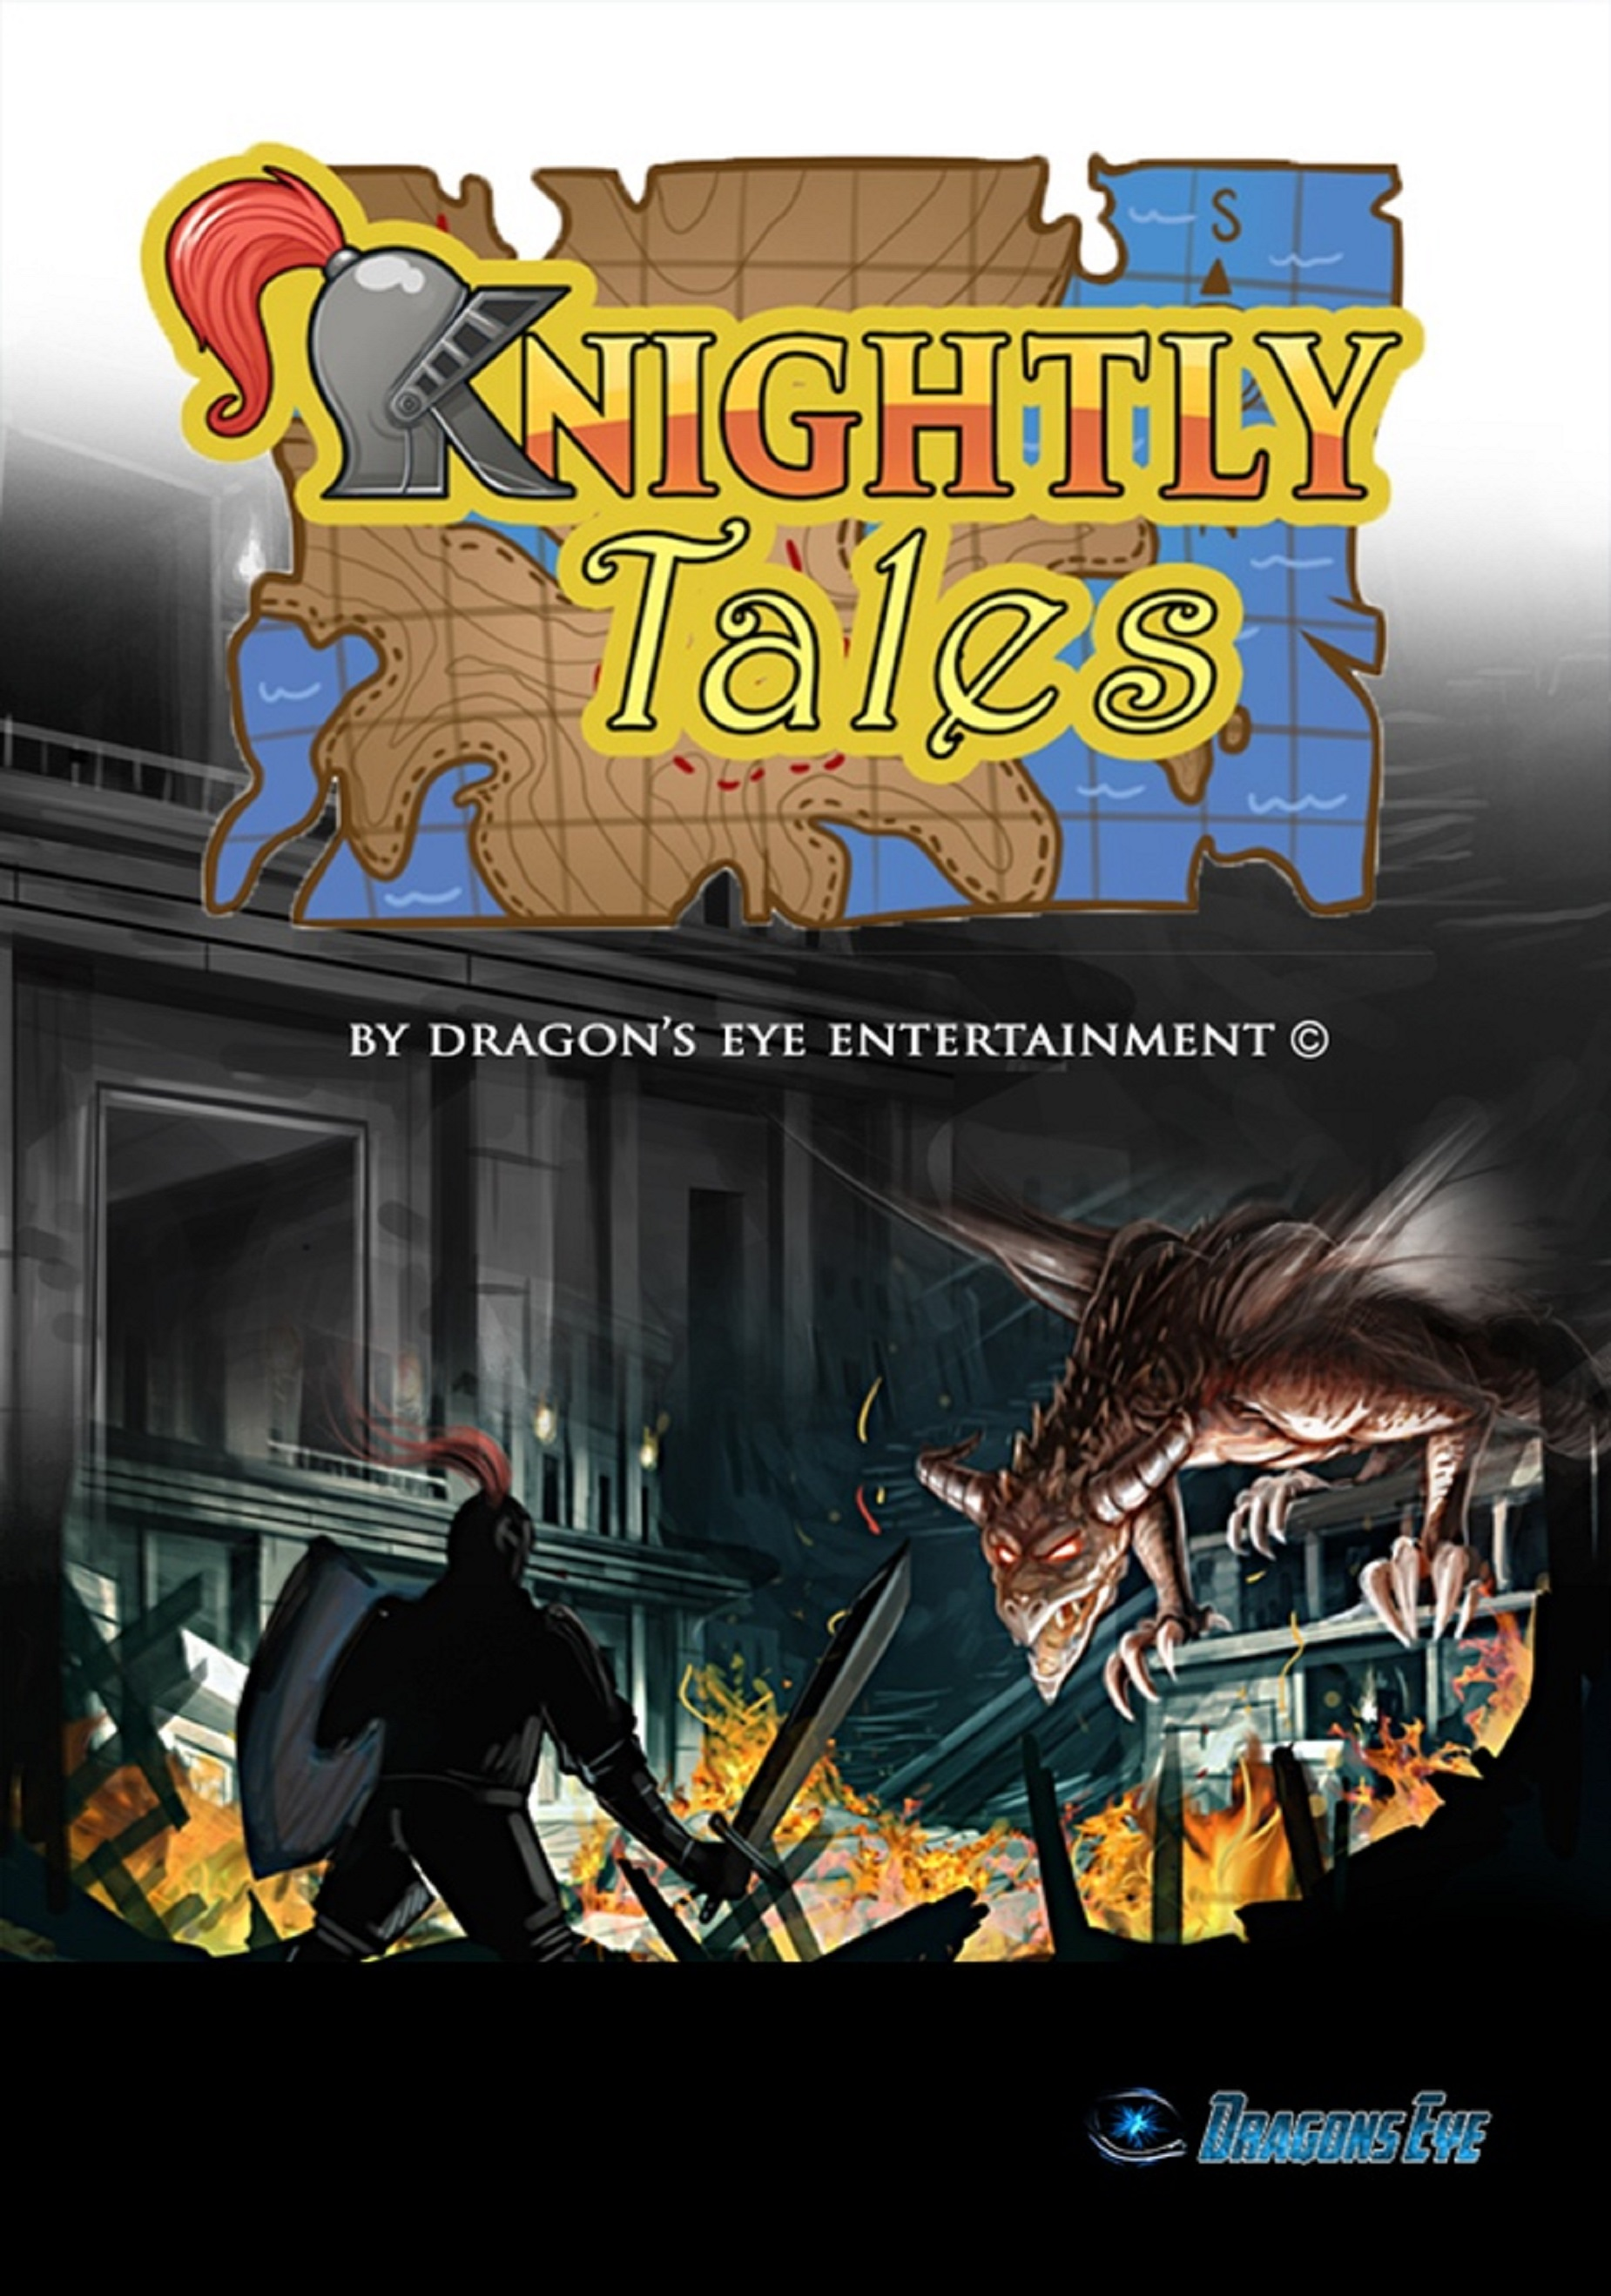 Knightly Tales